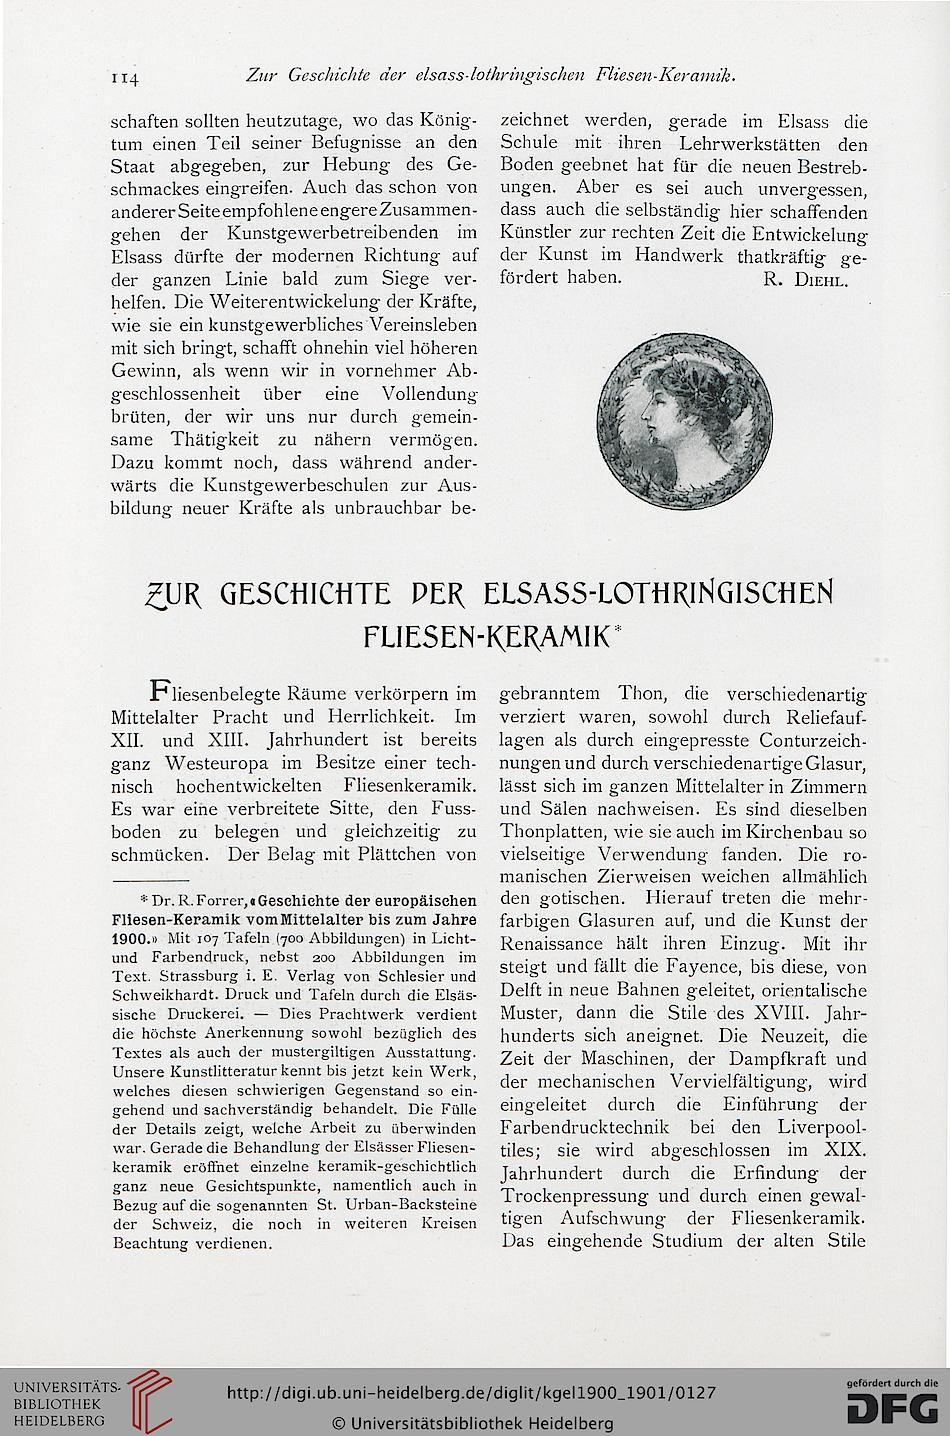 Das Kunstgewerbe in Elsaß-Lothringen  — 1.1900-1901 - VIA HEIDELBERG